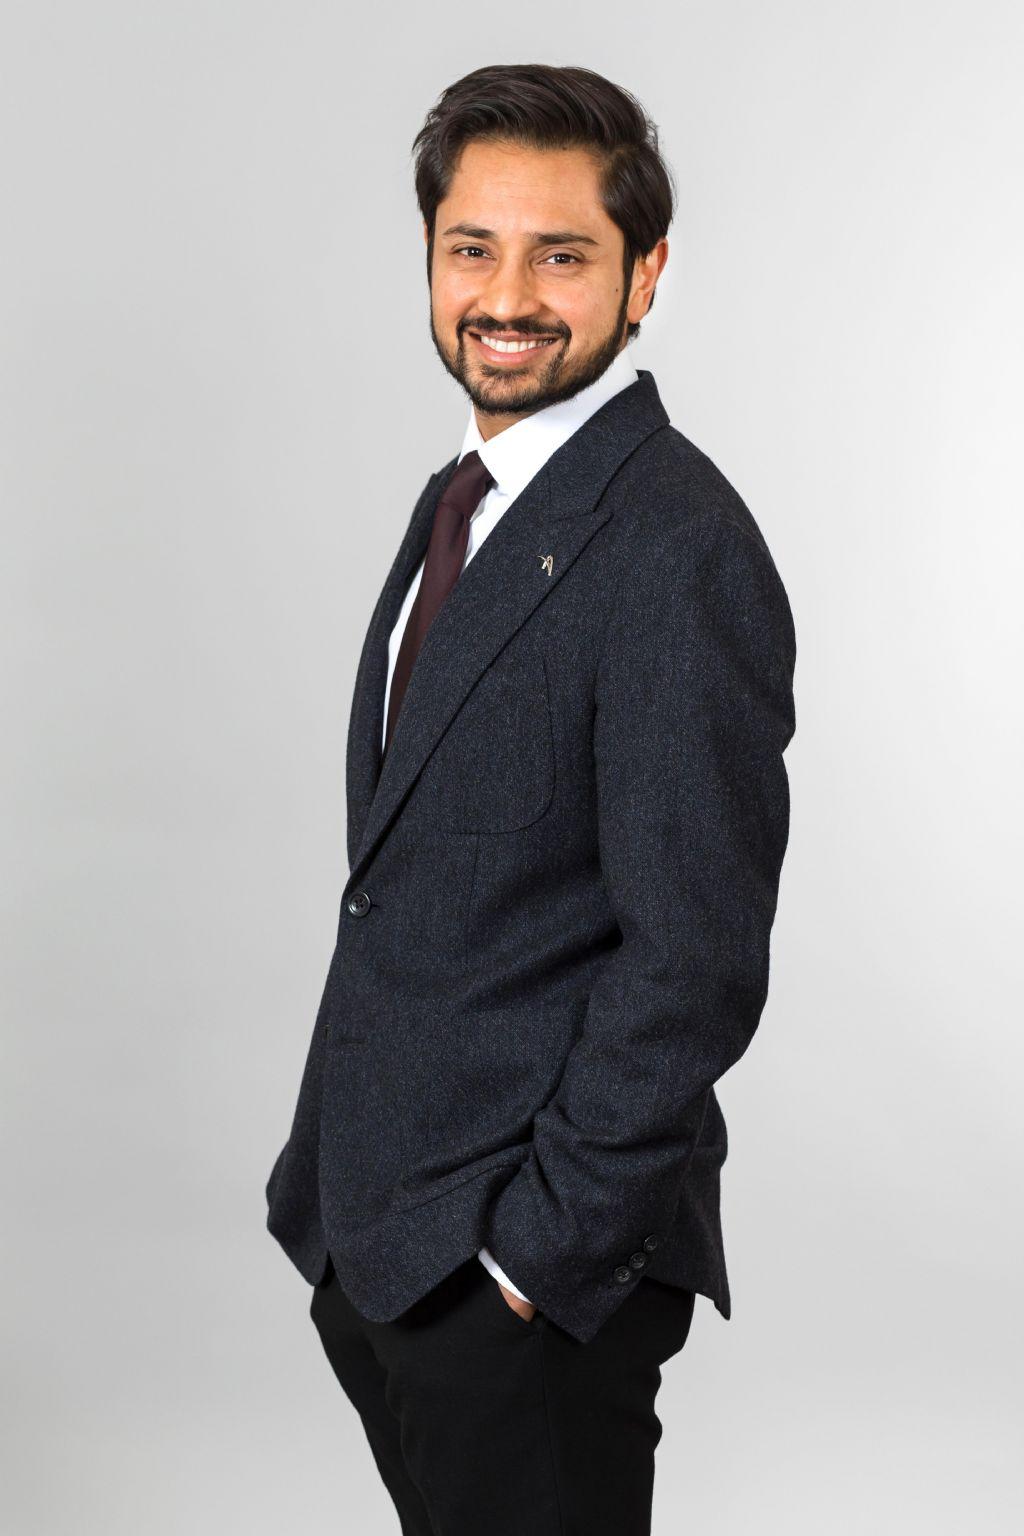 Aditya Mittal, CEO ArcelorMittal